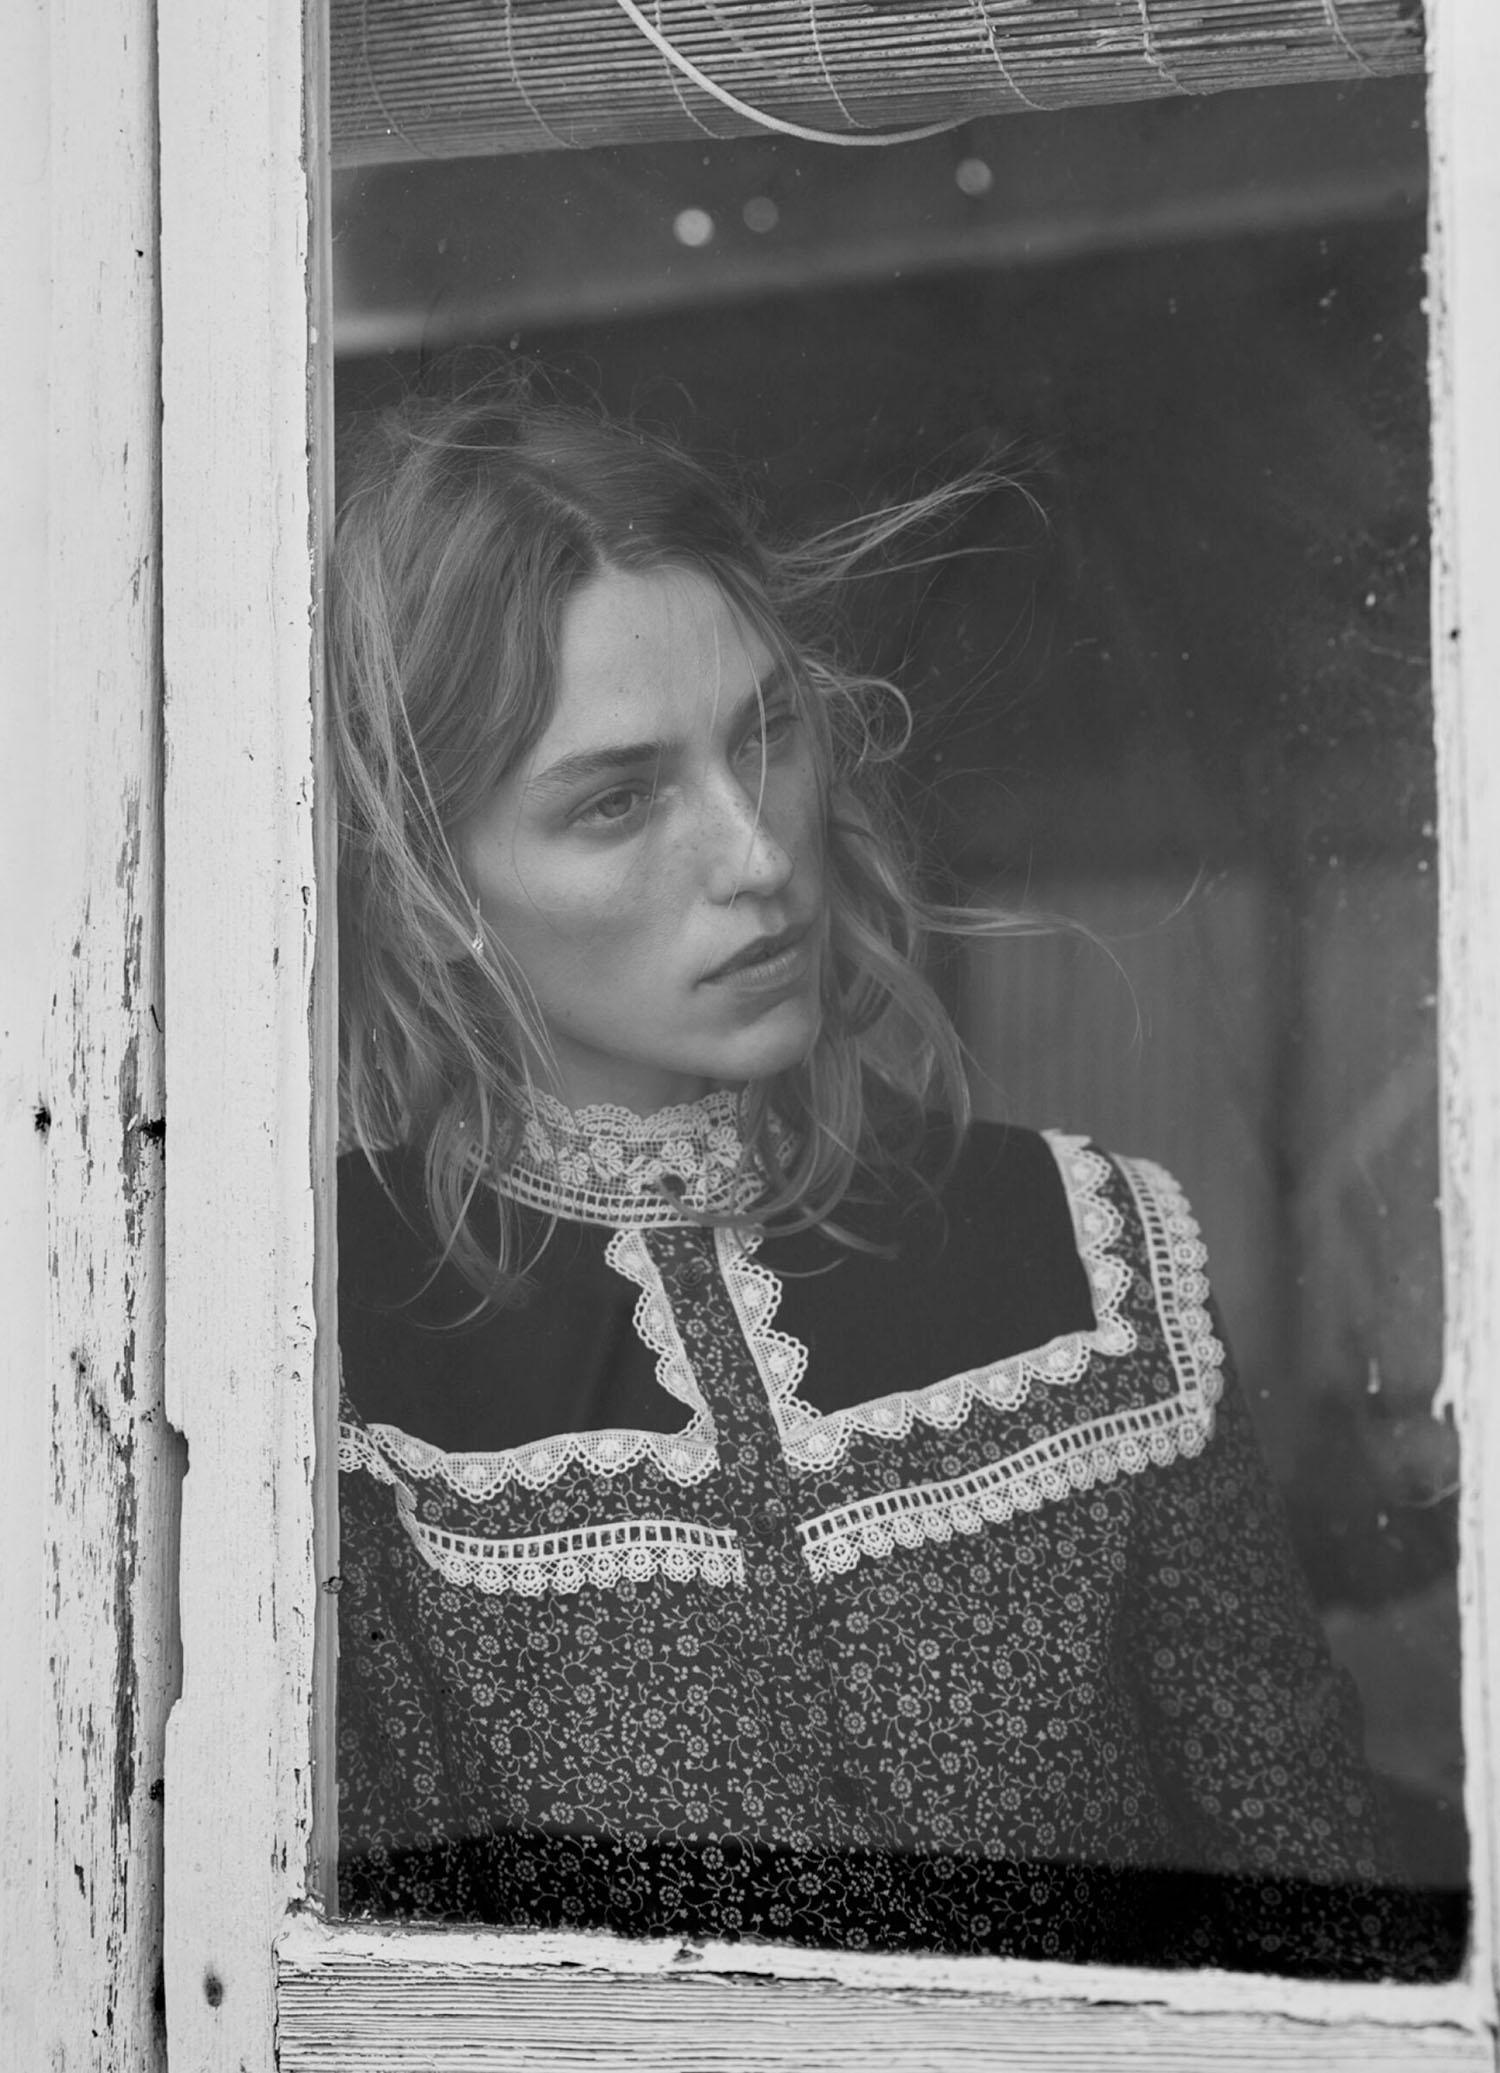 Linnea Grondahl by Nicole Bentley for Marie Claire Australia August 2021